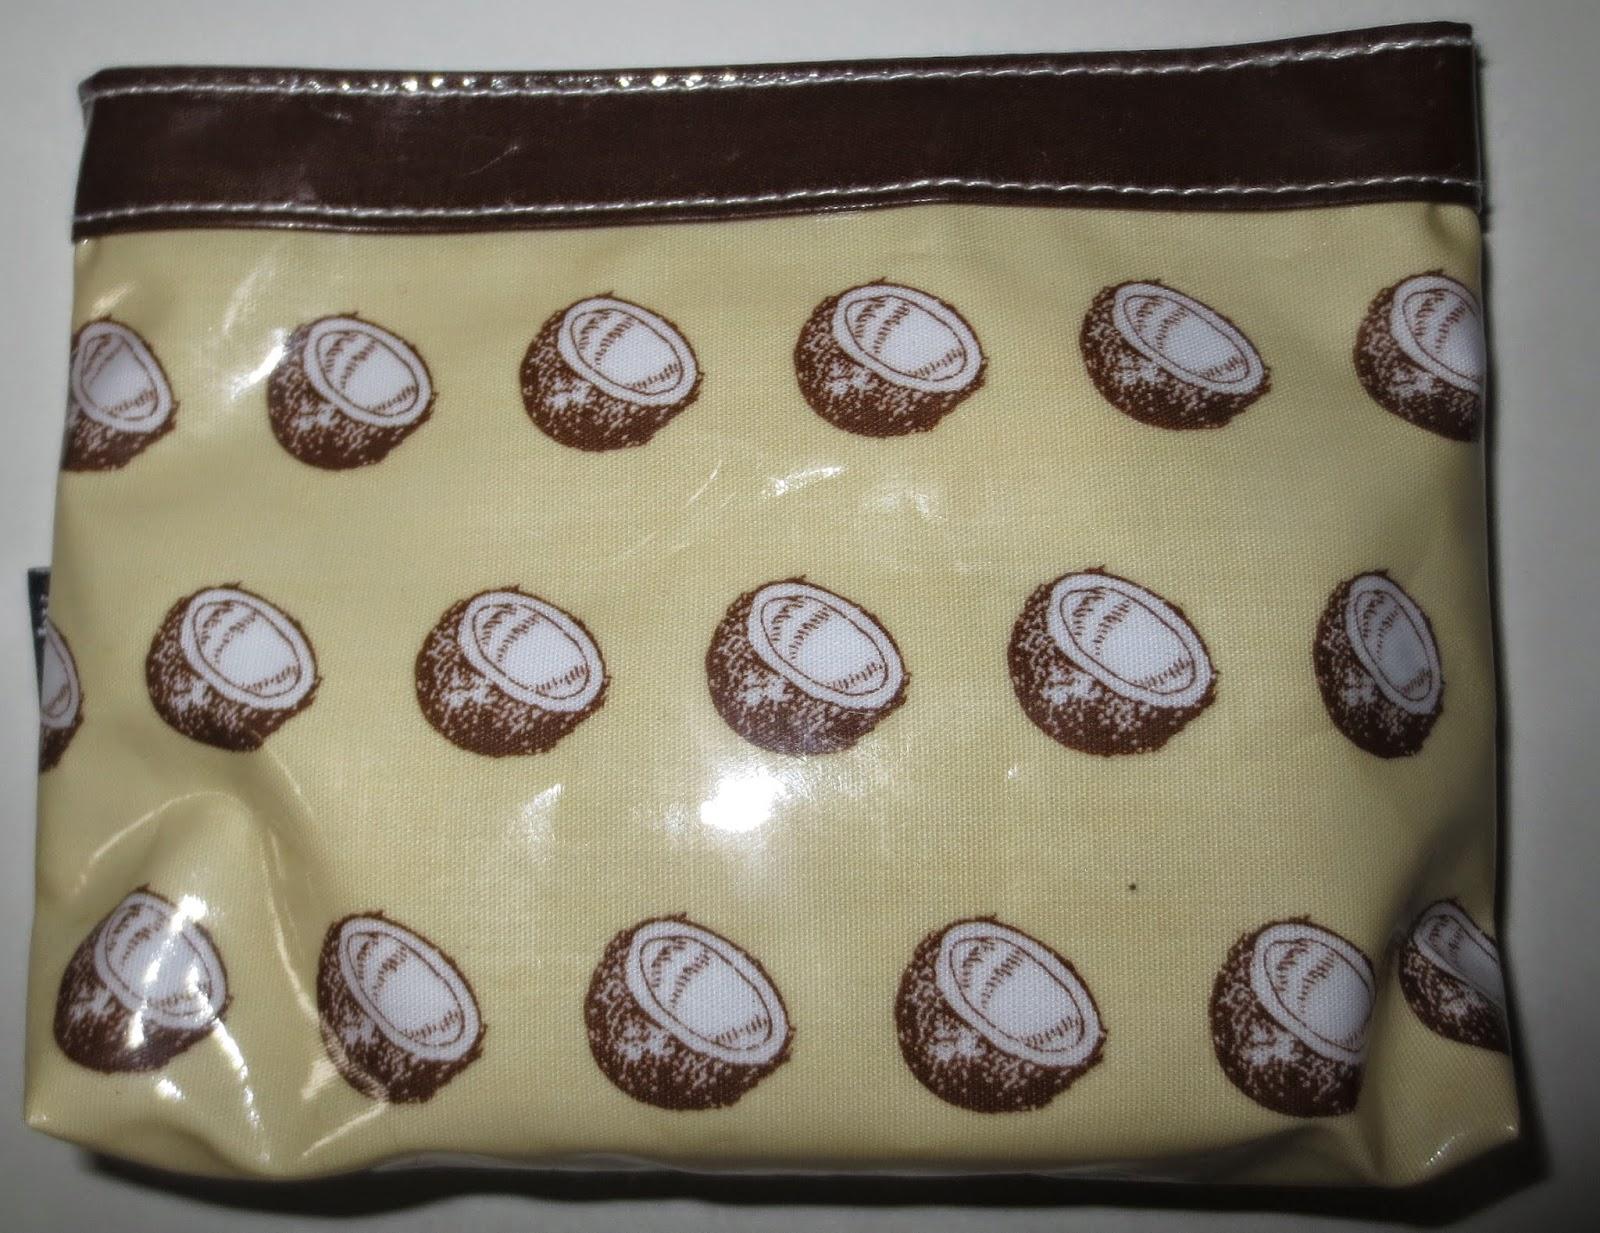 Philosophy Vanilla Coconut Limited Edition Gift Set Makeup Bag